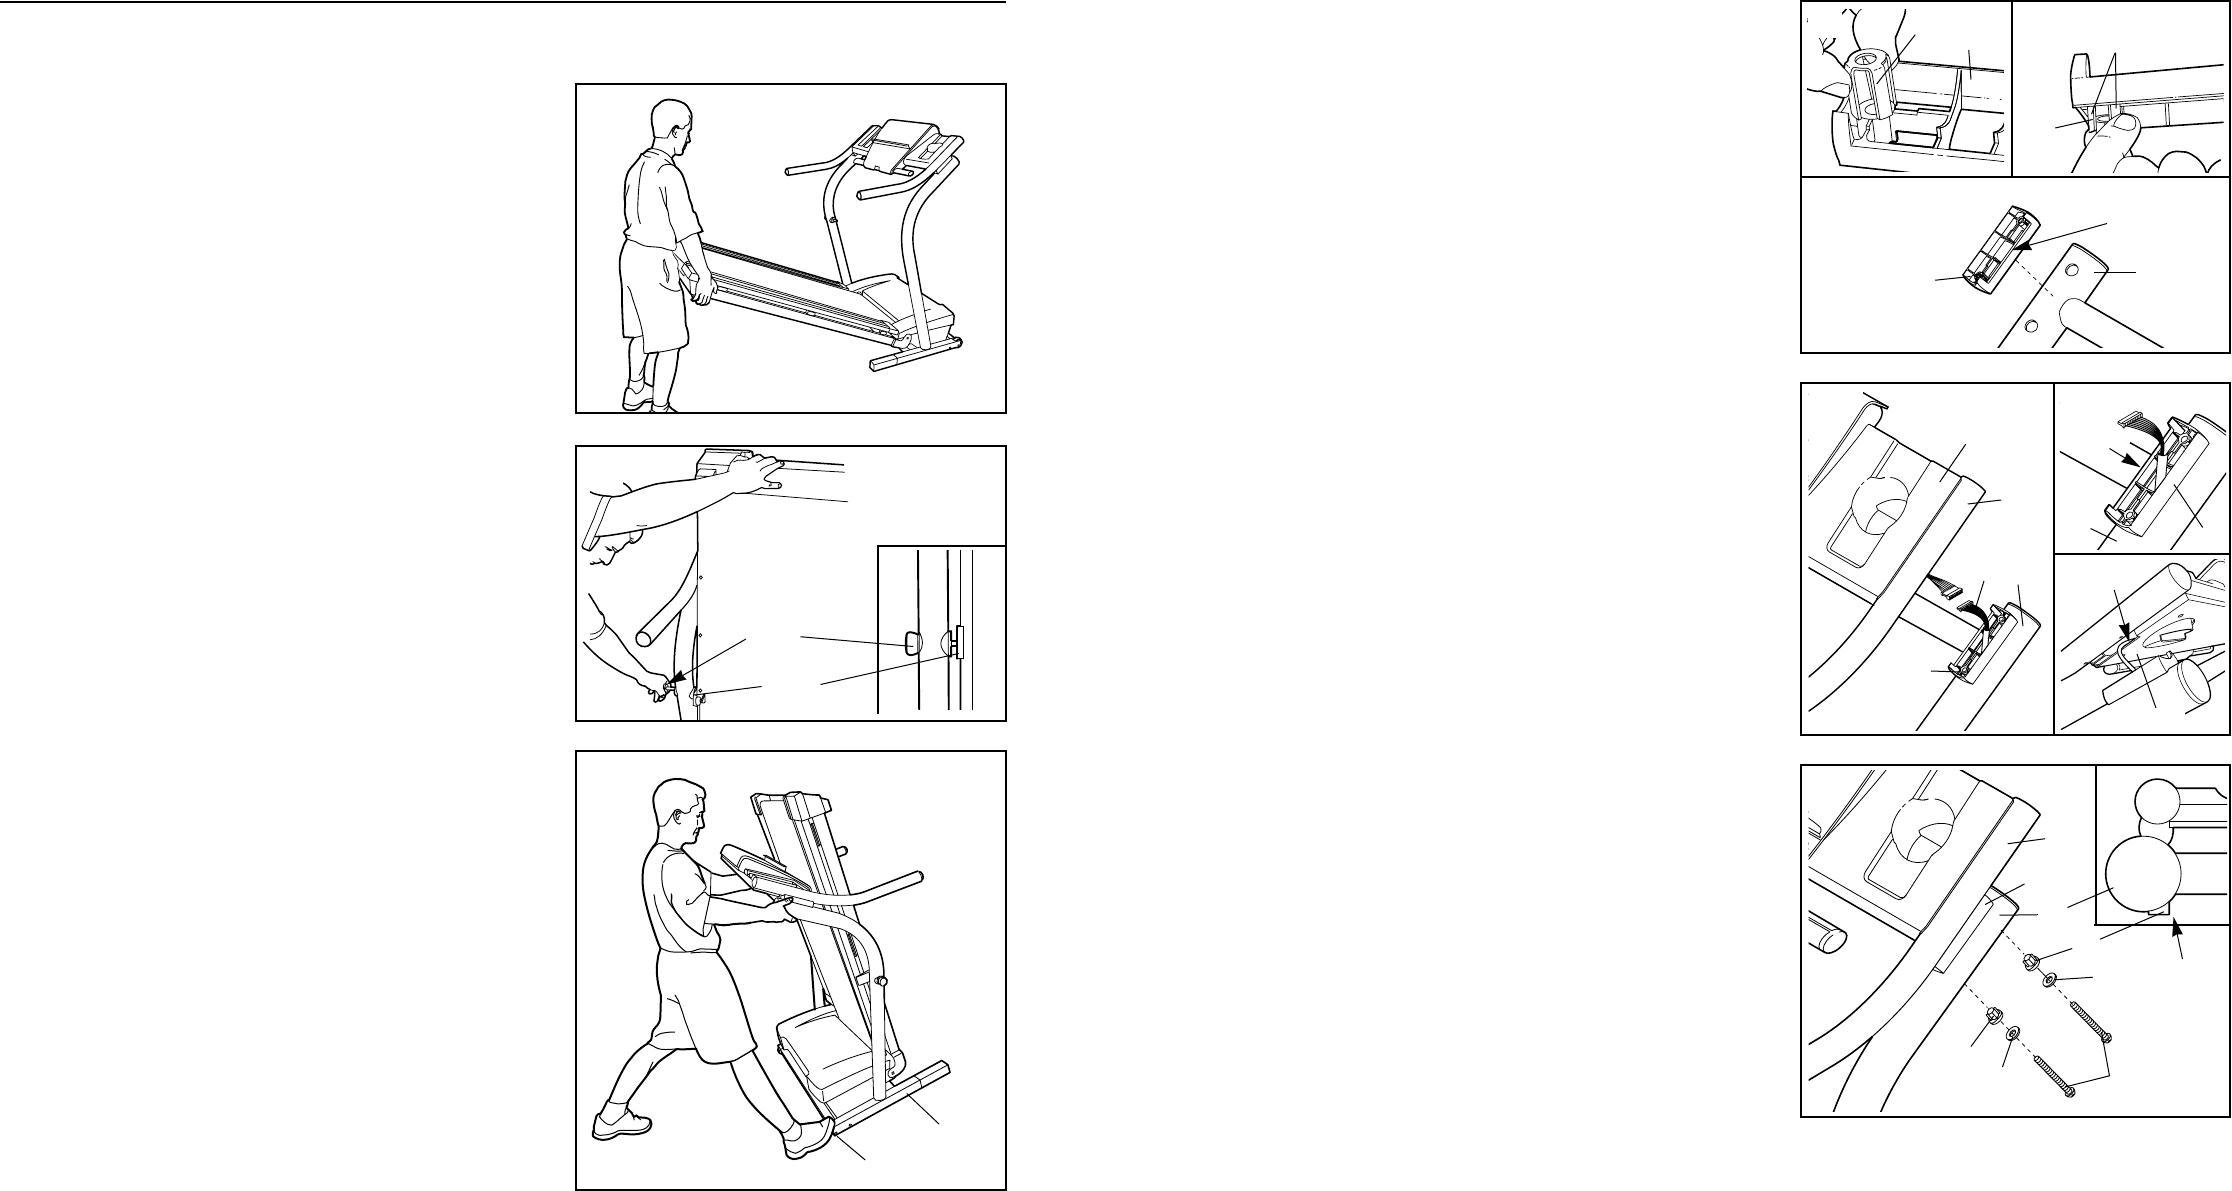 Nordictrack Exp1000 Wiring Diagram Electrical Diagrams Handleiding Exp 1000 Netl09910 Pagina 6 Van 17 English Exp1000s Treadmill Users Manual